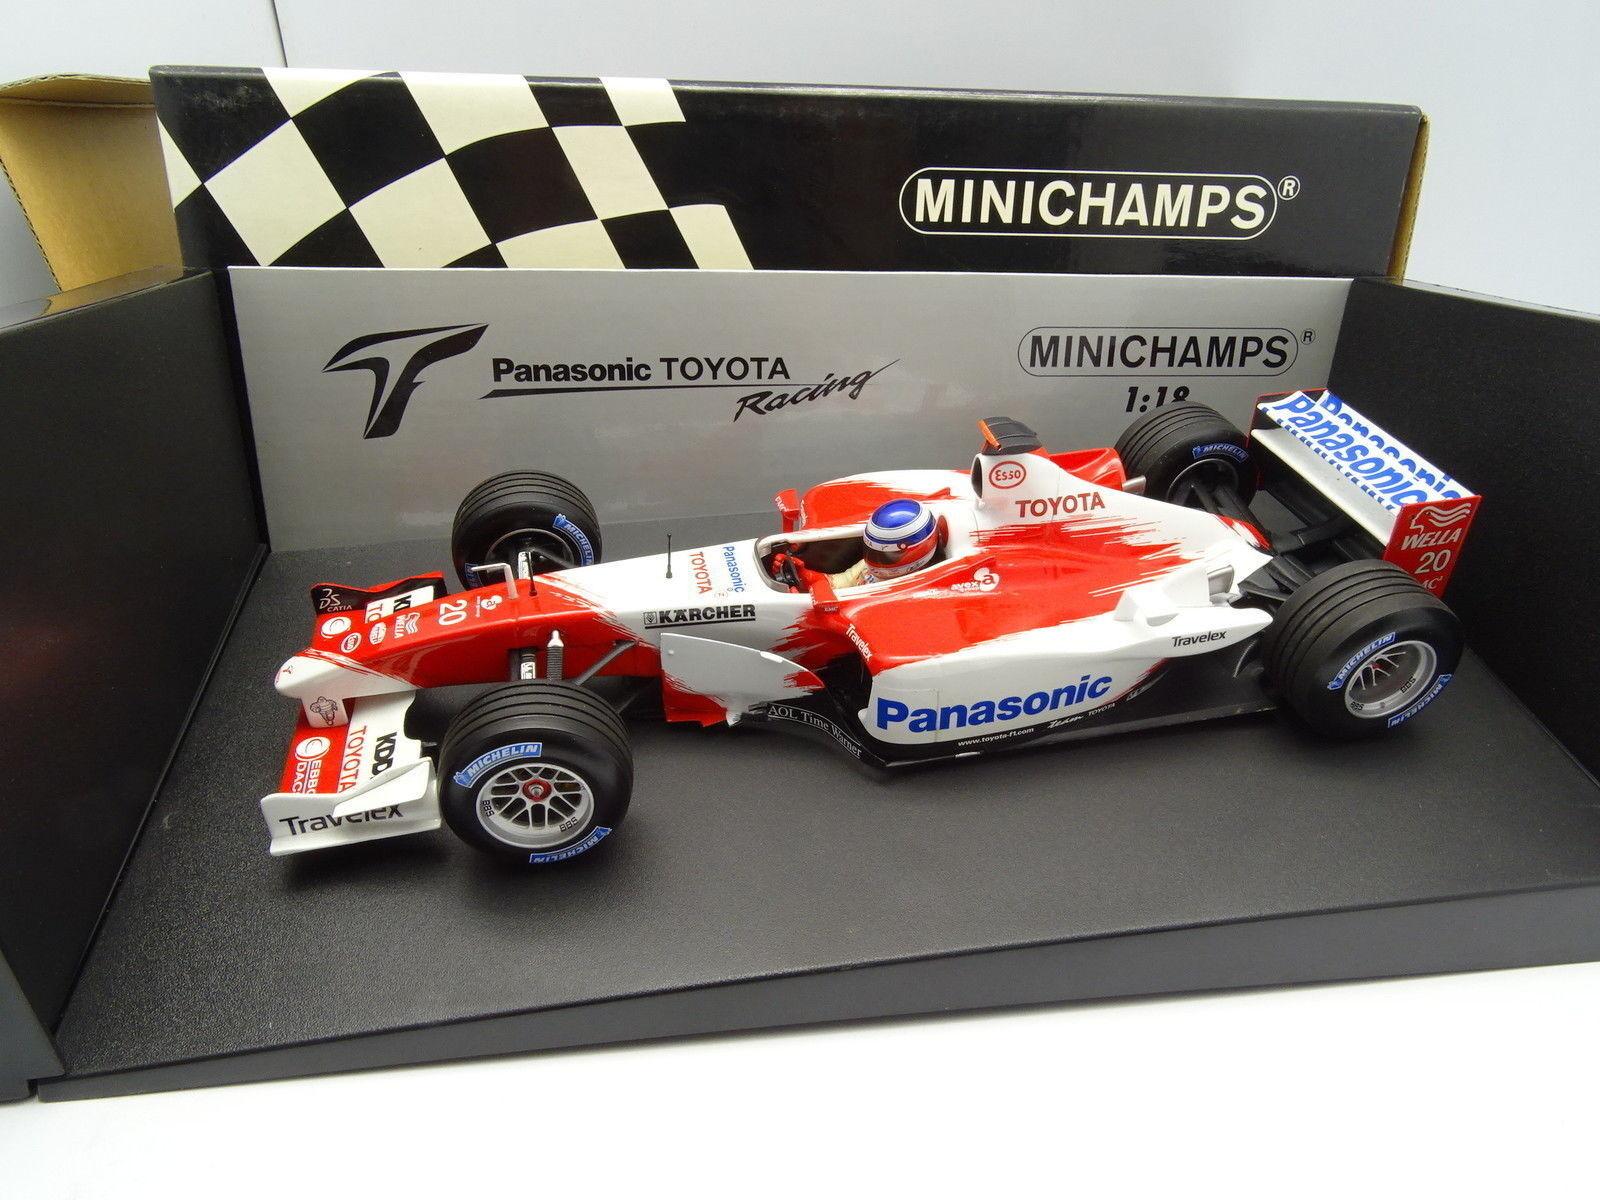 Minichamps 1/18 - F1 Panasonic Toyota Corsa TF103 Panis